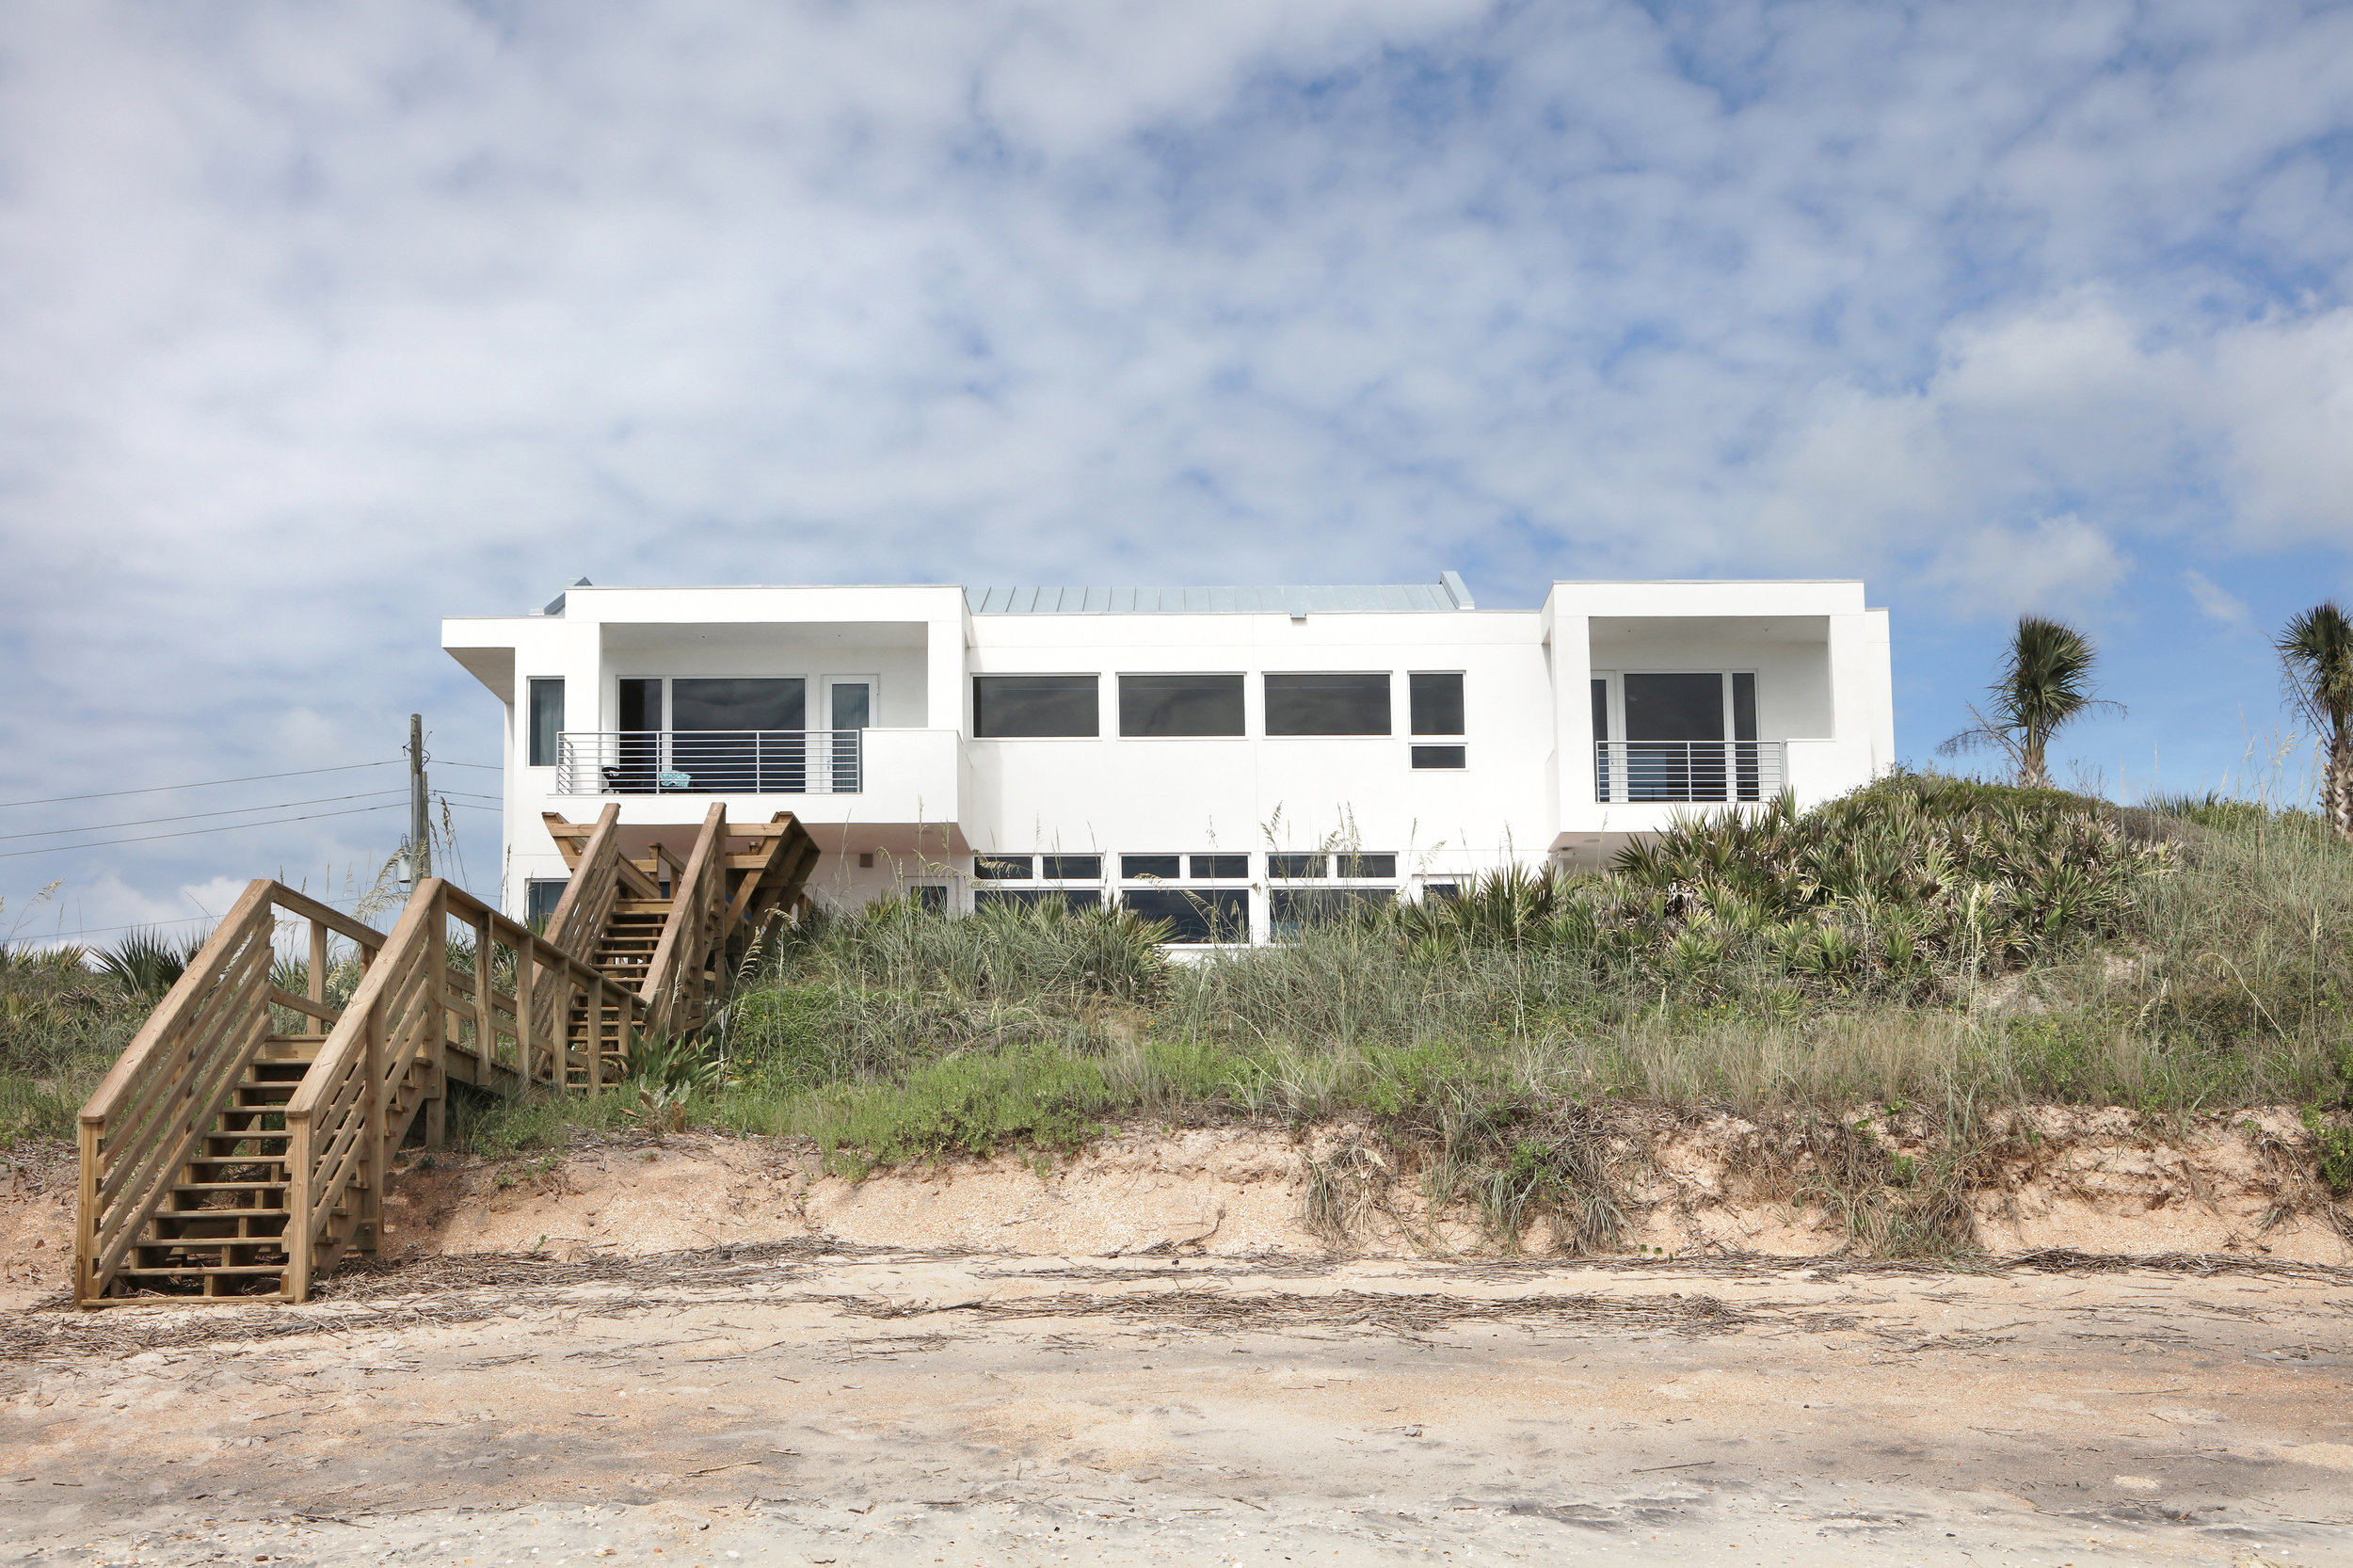 St. Augustine Beach Residence, Florida, 2016